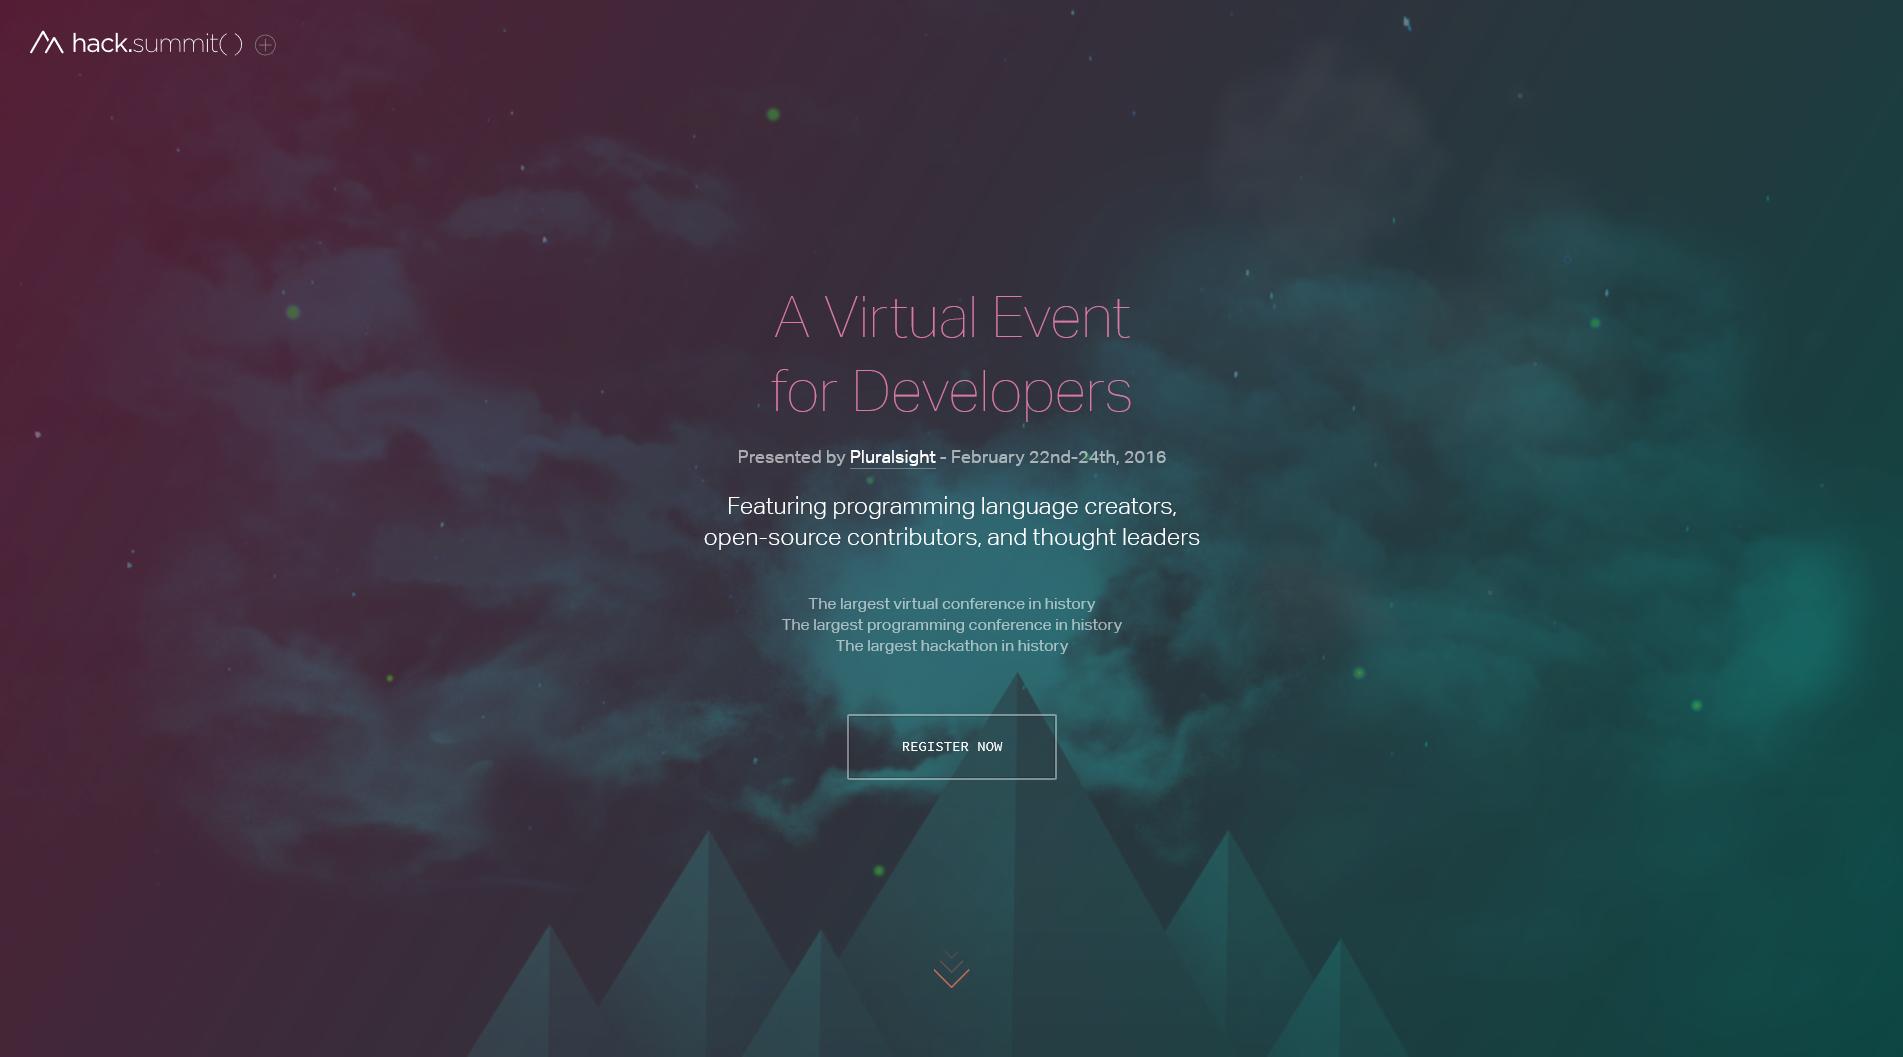 design-hacksummit.org